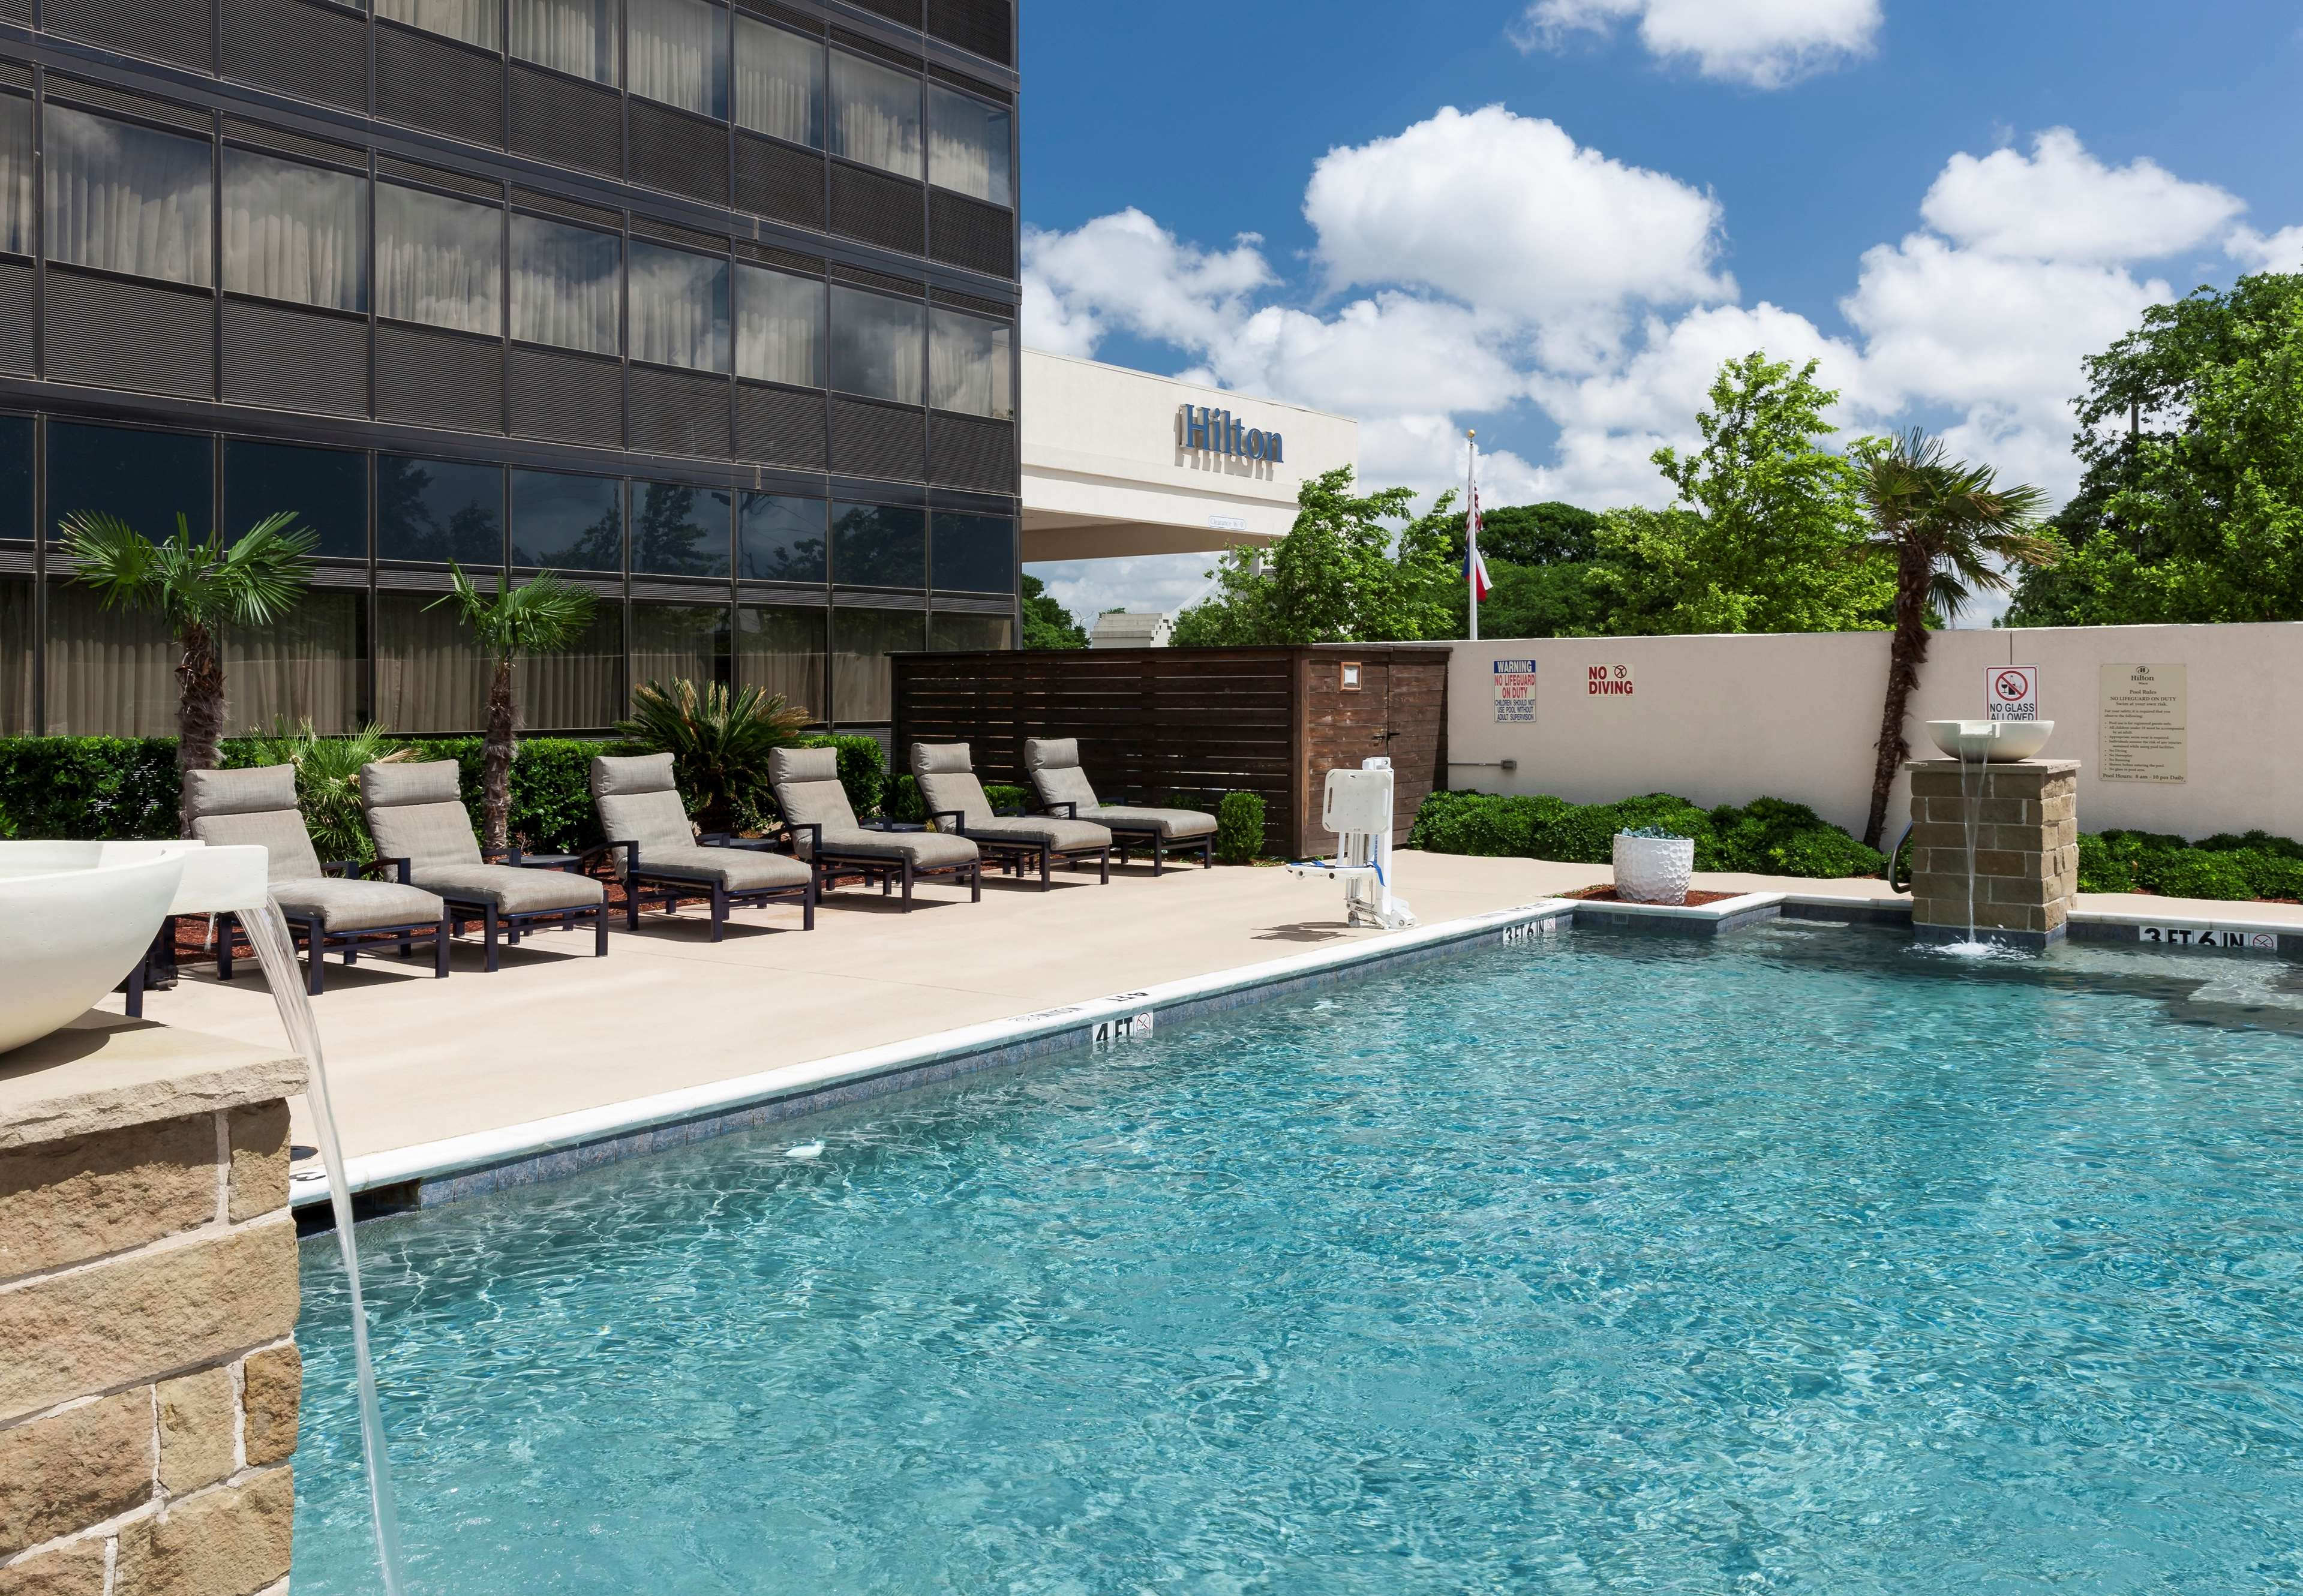 Hilton Waco image 20